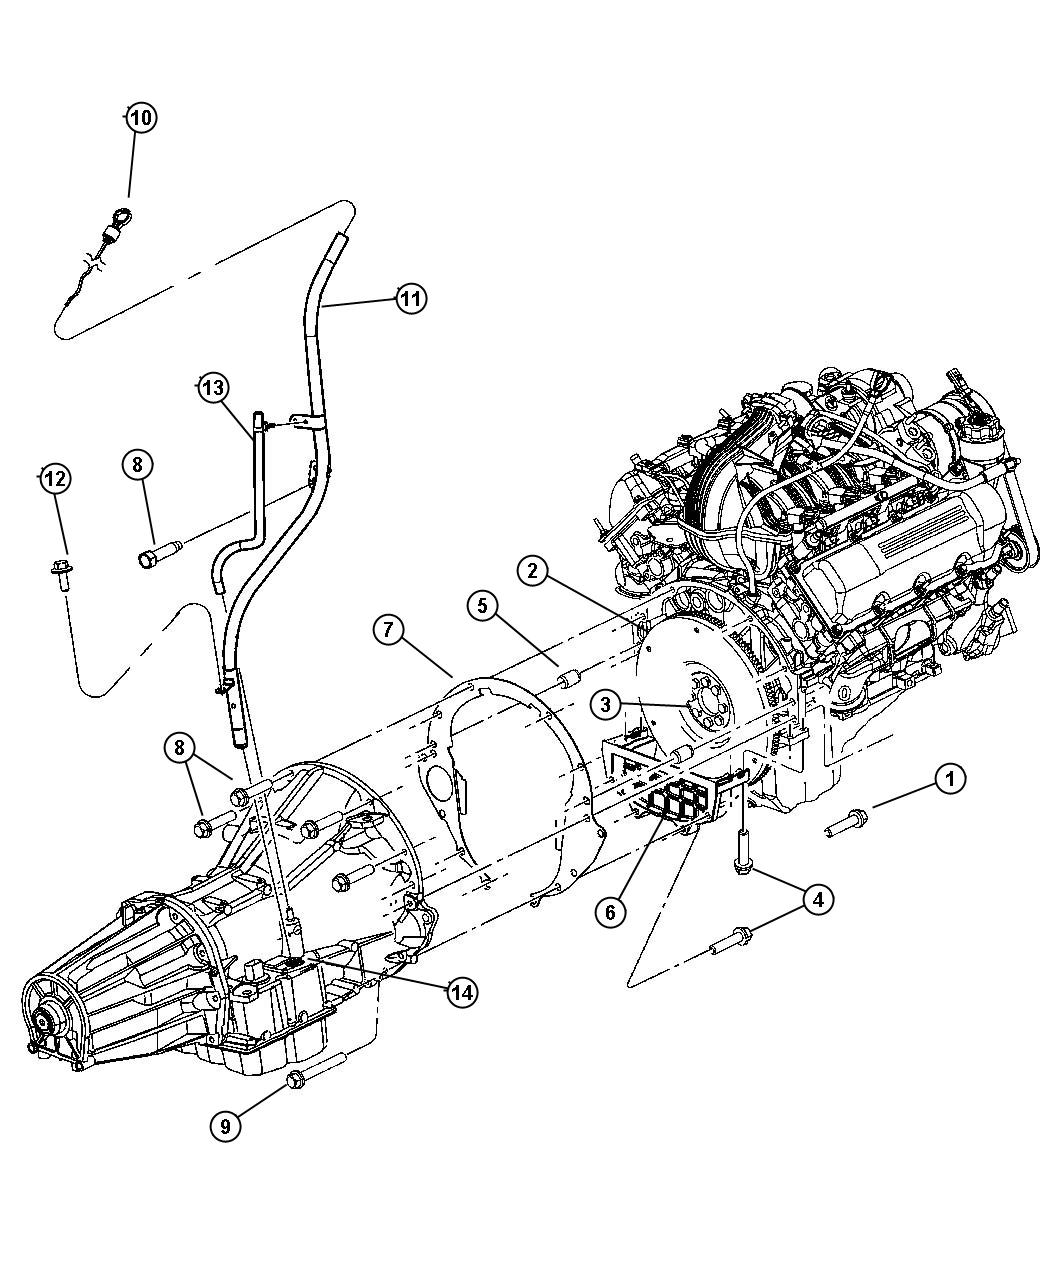 Diagram  2000 Dodge Durango Vent Diagram Manual Full Version Hd Quality Diagram Manual